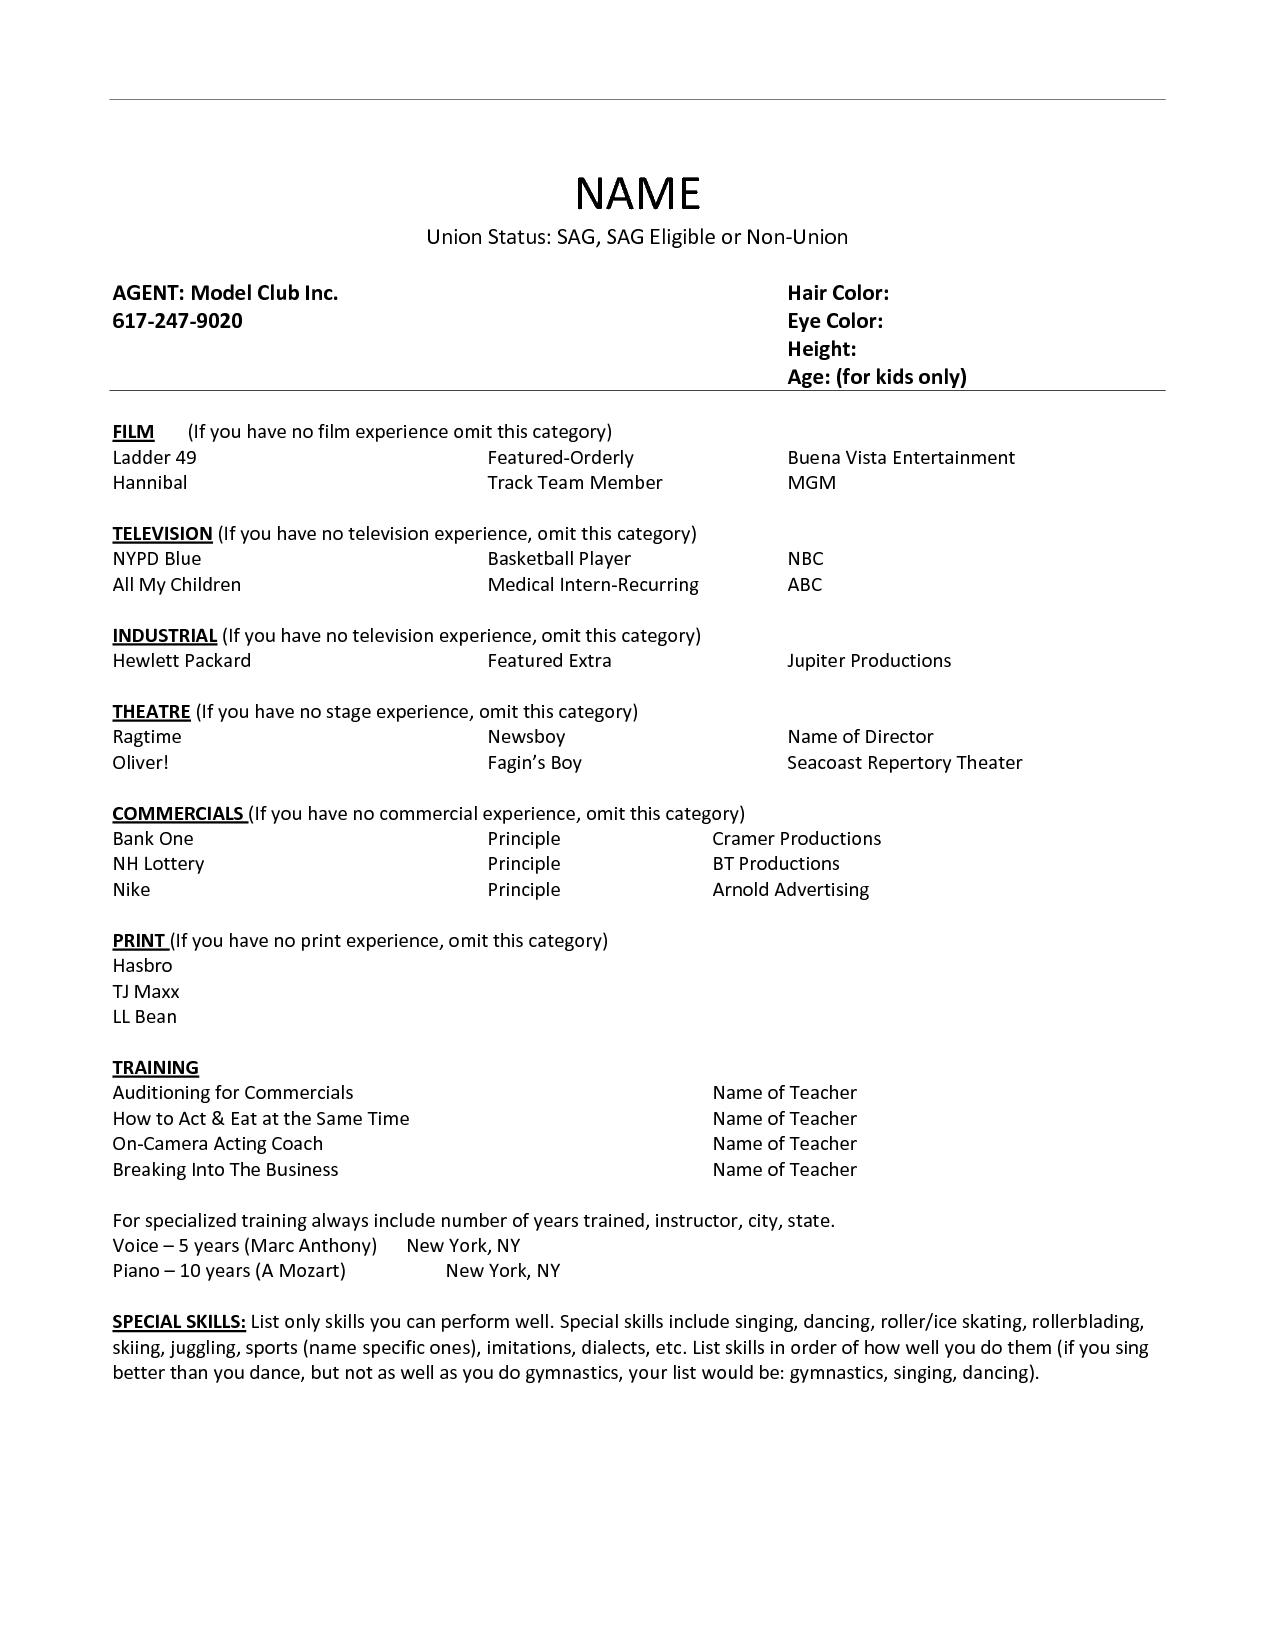 Formatting Your Resume